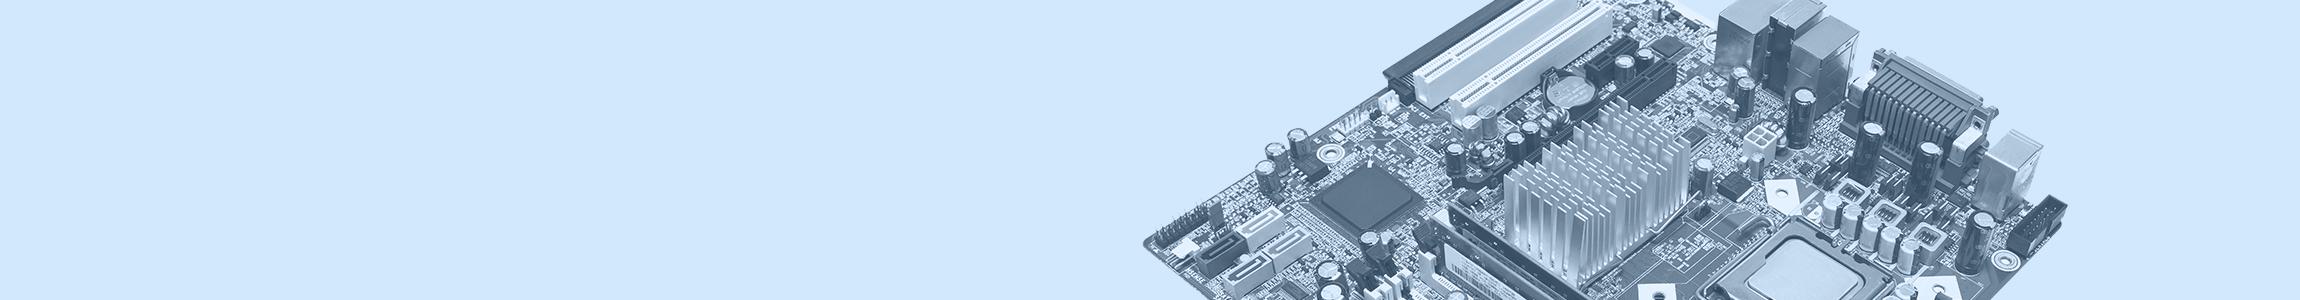 Computer Repair Service Software